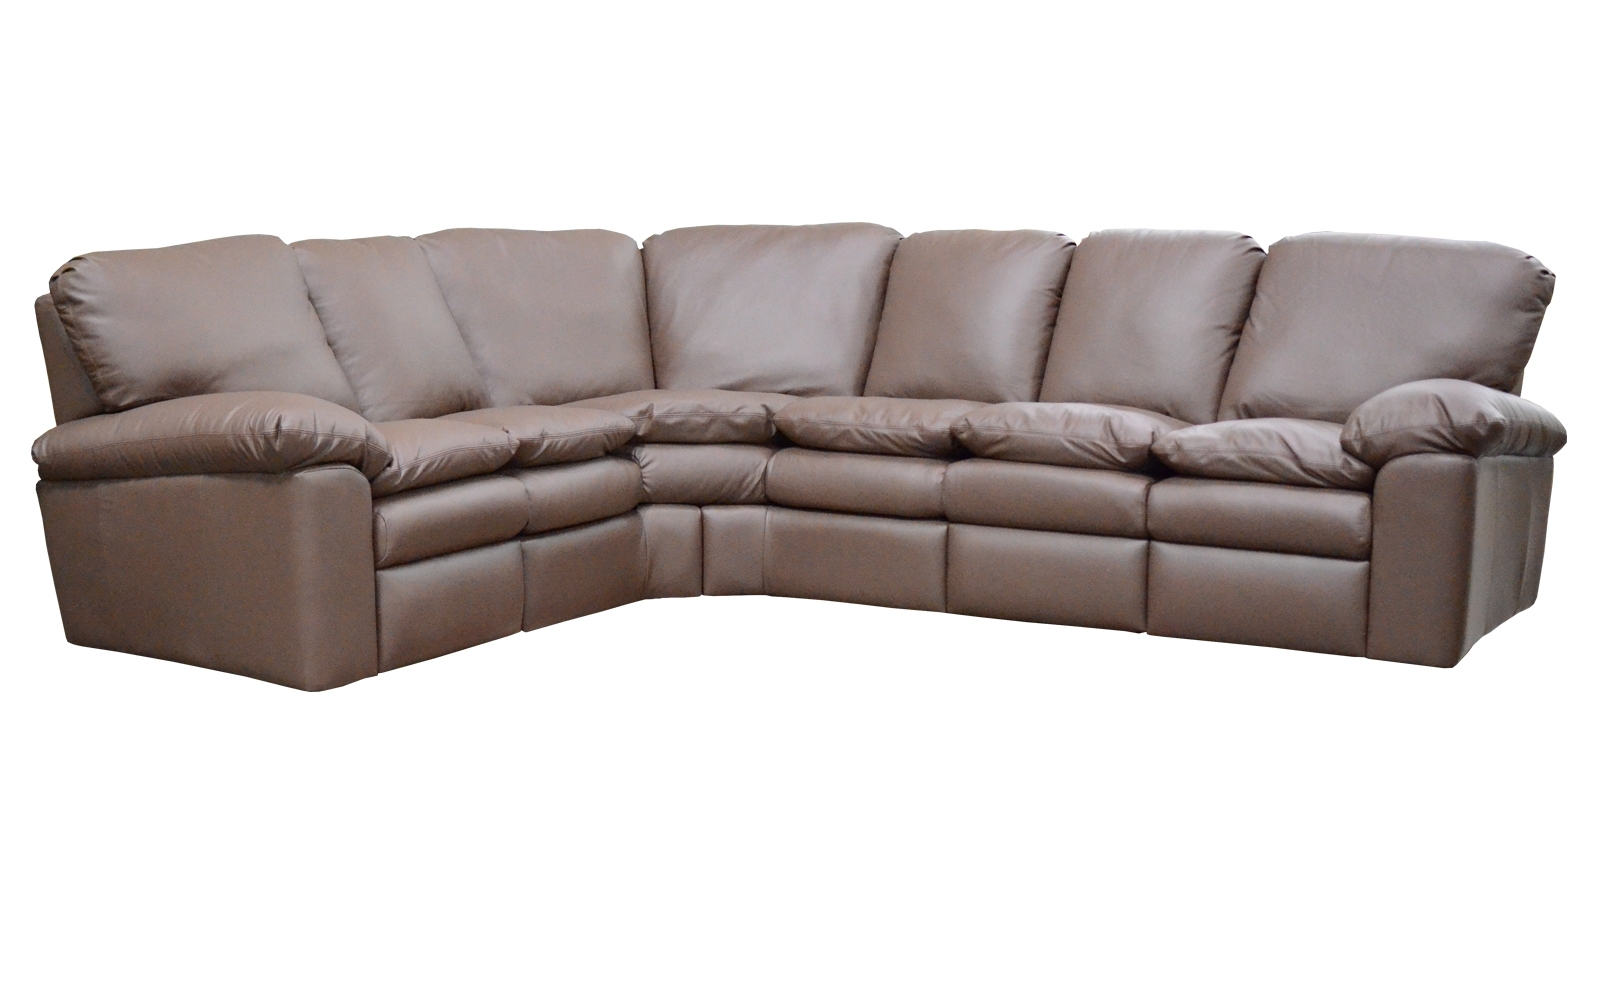 Latest El Dorado Sectional – Omnia Leather With Regard To El Dorado Sectional Sofas (View 13 of 20)